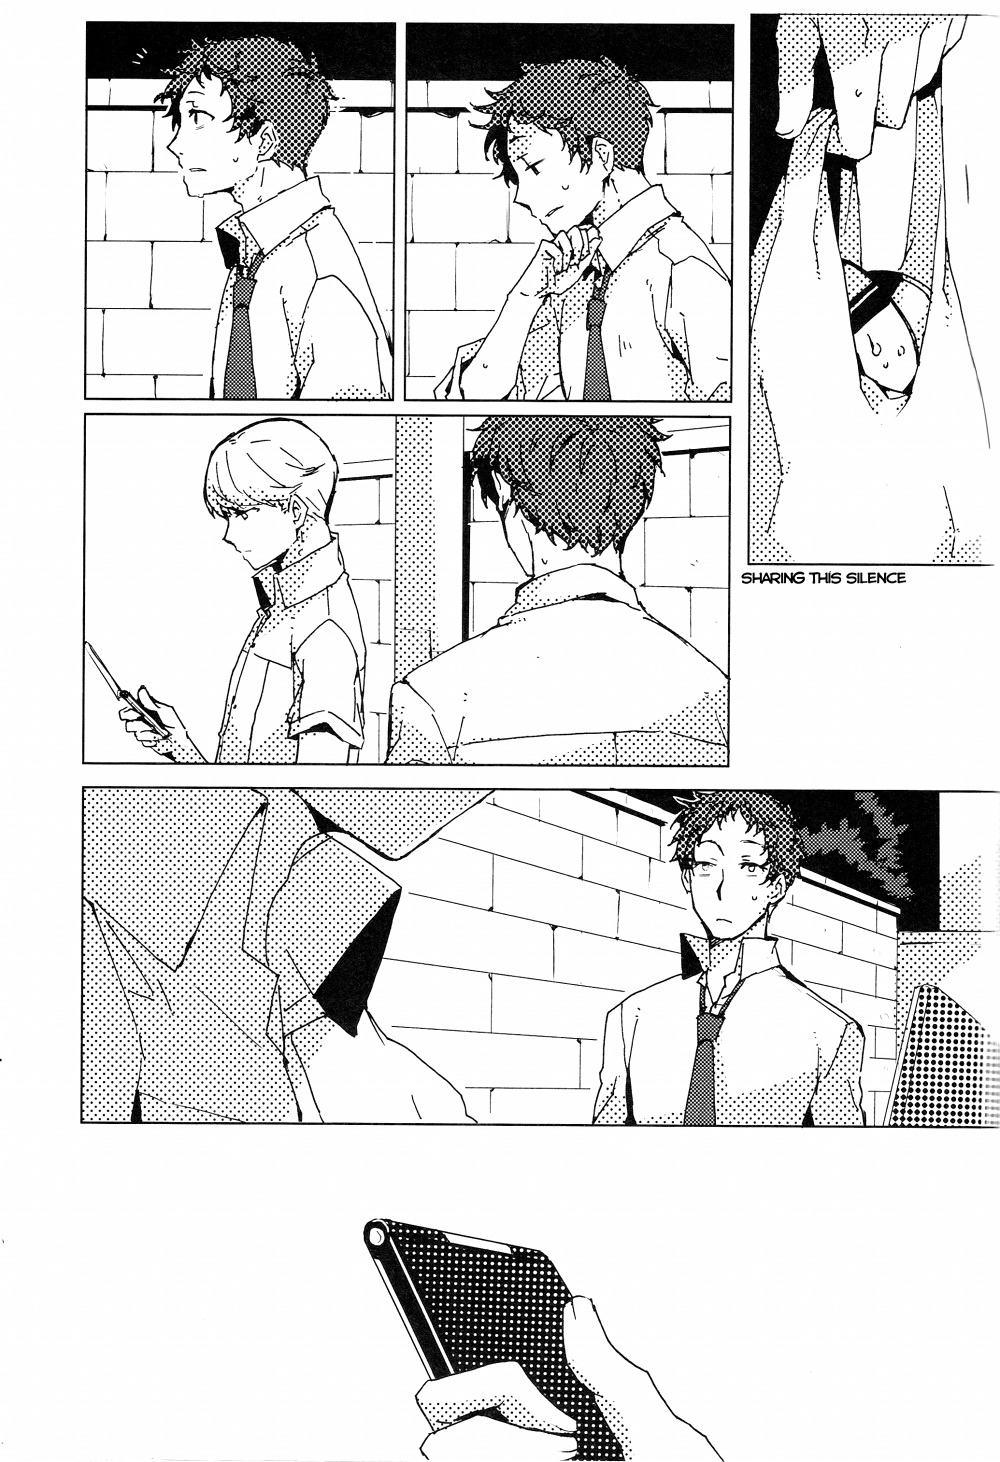 Trang 1 - Chia Sẻ Sự Tĩnh Lặng (- HEART STATION (Ebisushi)) - Truyện tranh Gay - Server HostedOnGoogleServerStaging